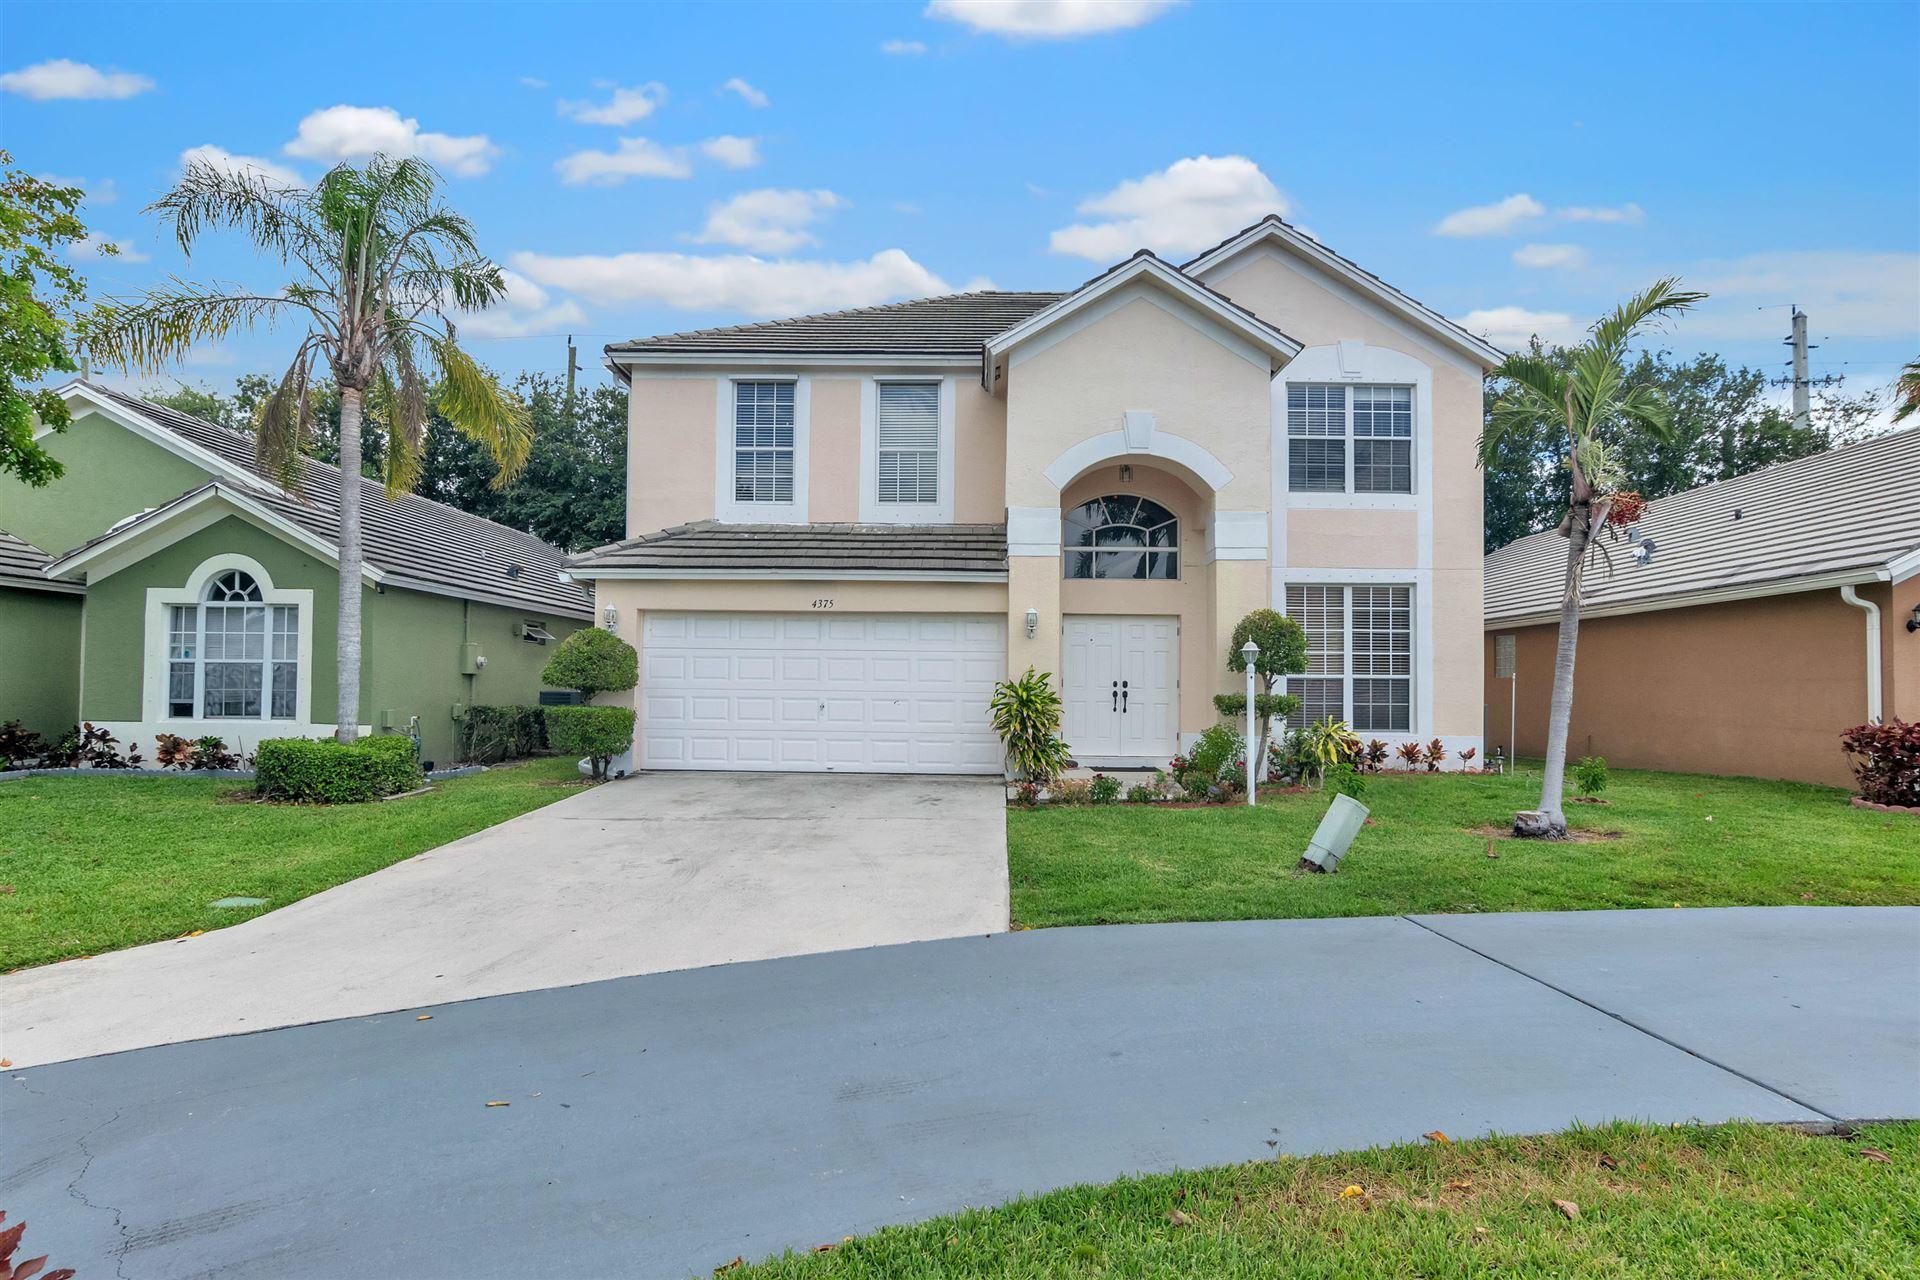 4375 Leicester Court, West Palm Beach, FL 33409 - #: RX-10721219